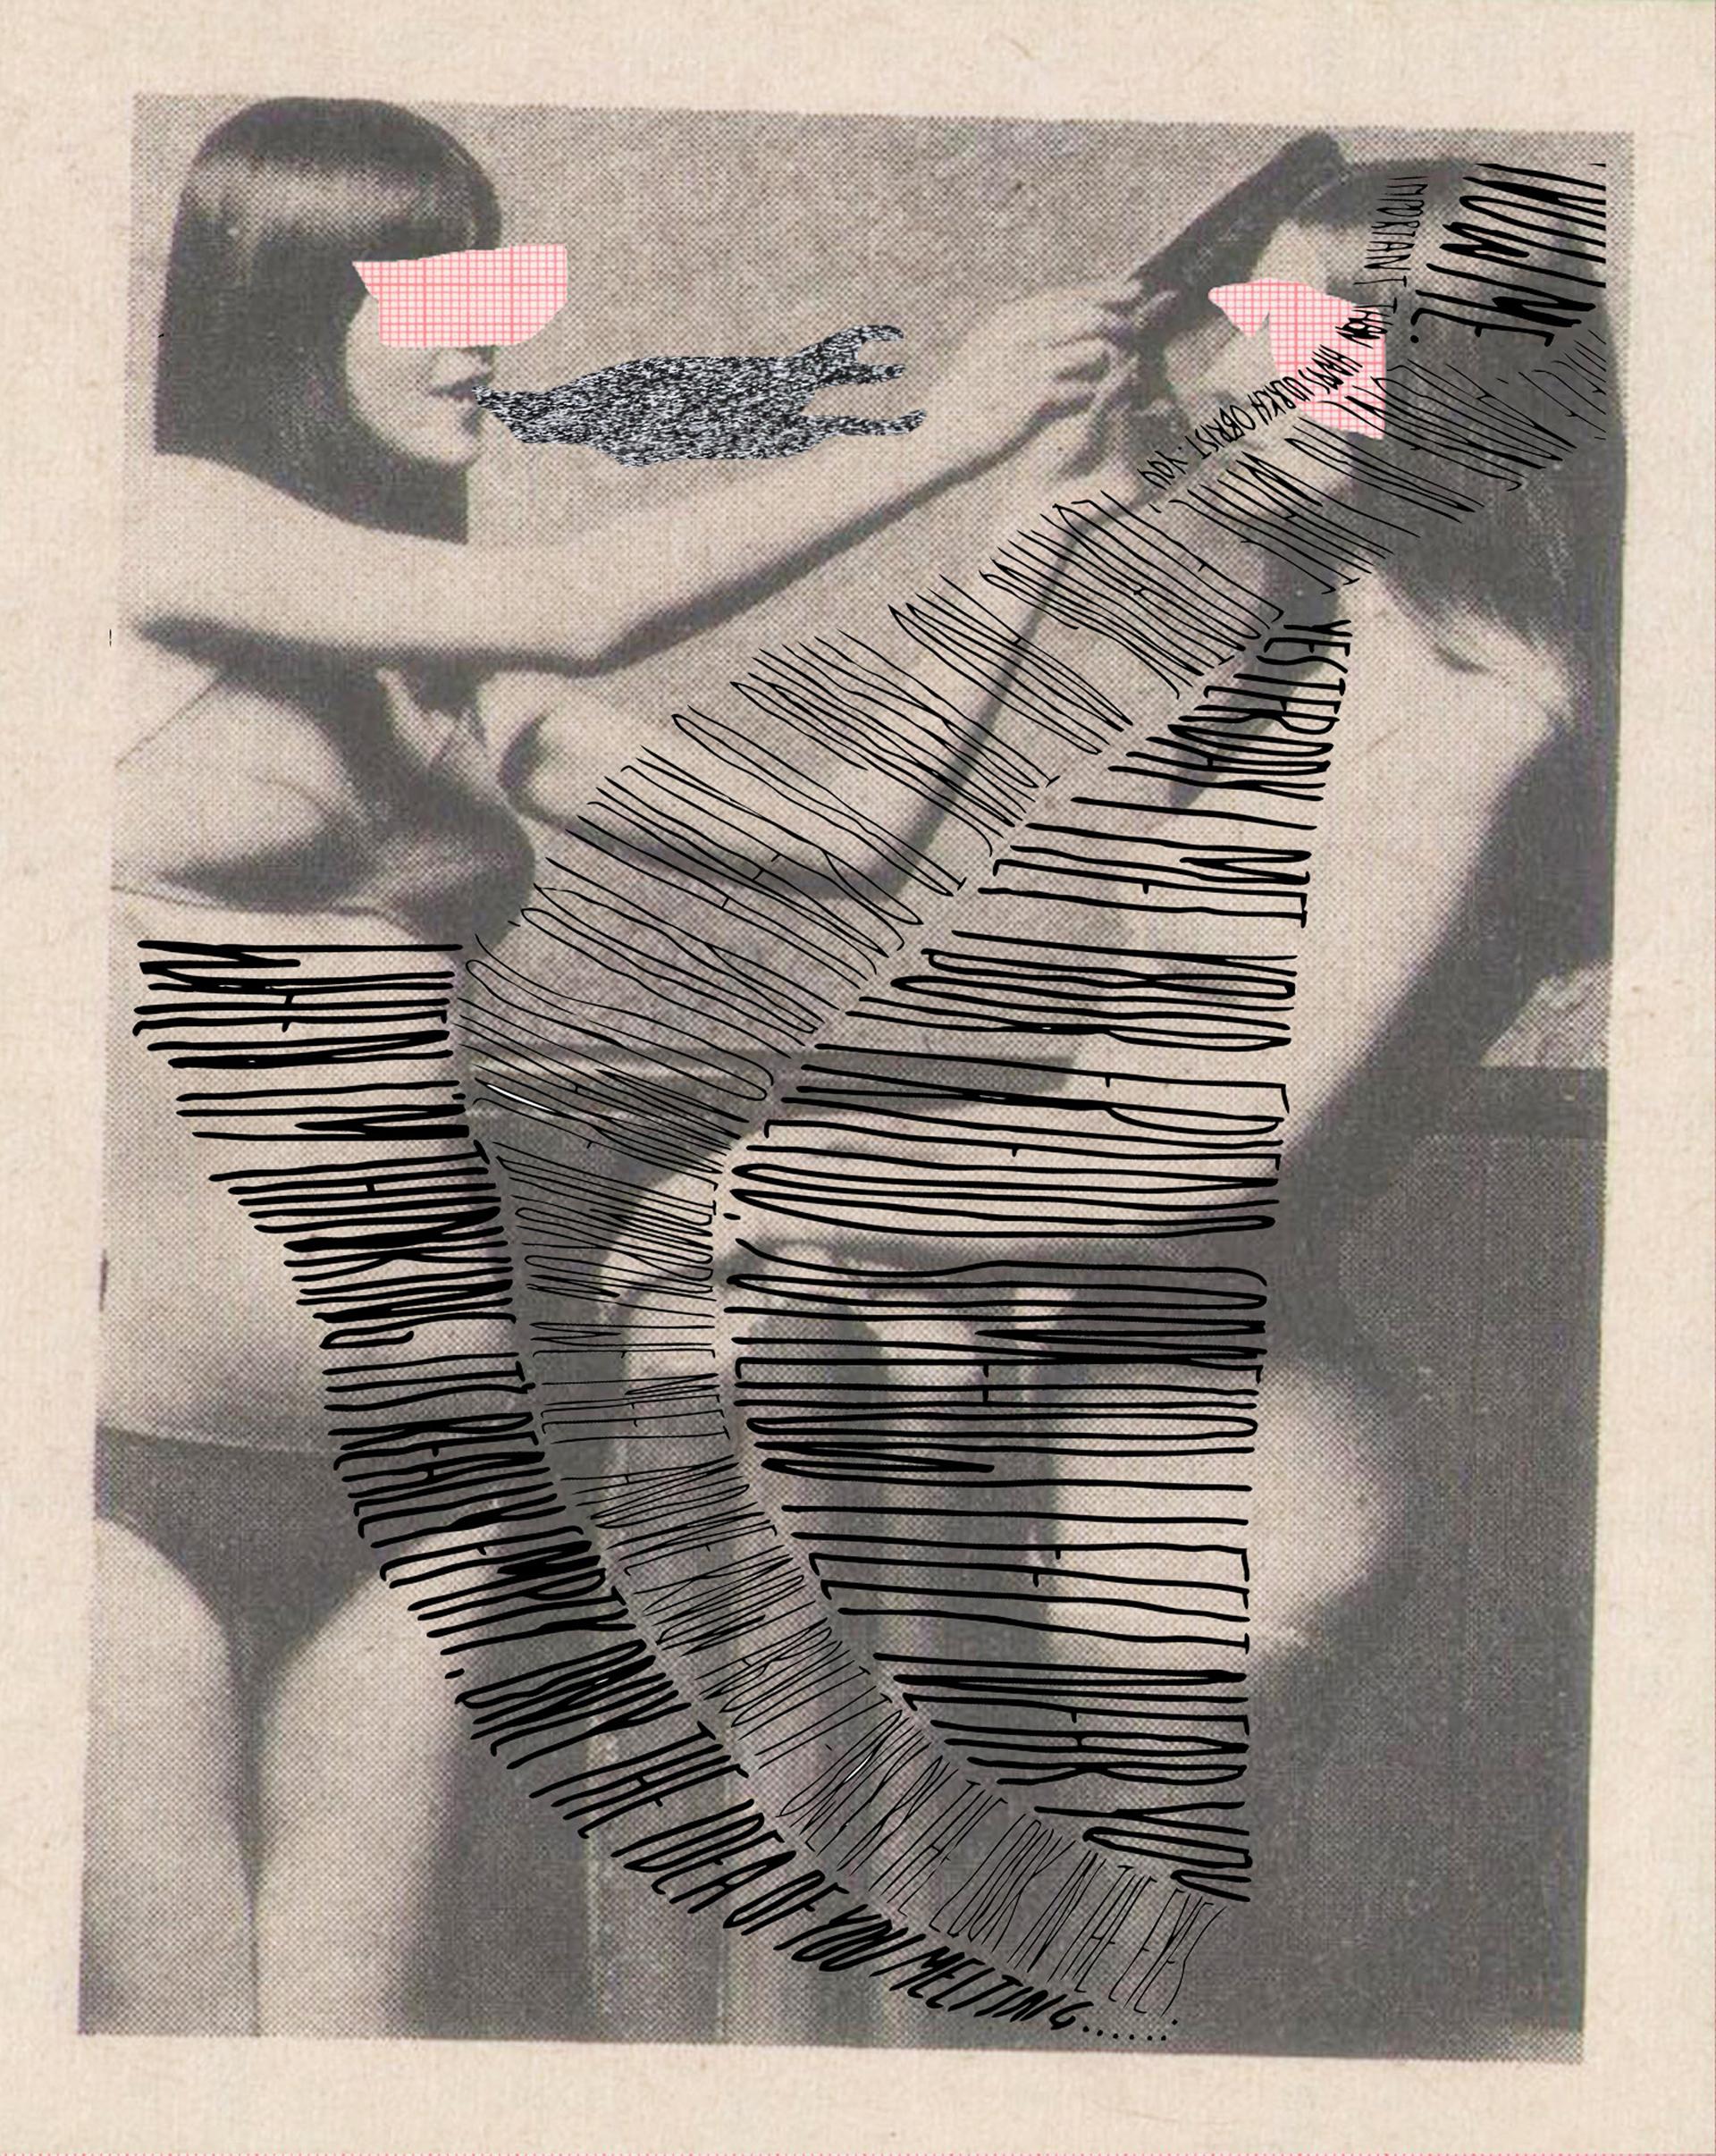 Galería: LambdaLambdaLambda. Pristine, Kosovo. Artista: Juan Pablo Mariano & Dardan Zhegrova. Título: Alone in white, floating and trying to reach you. Técnica: Extract from Zine Año: 2017. Dimensiones: 21 x 15 cm